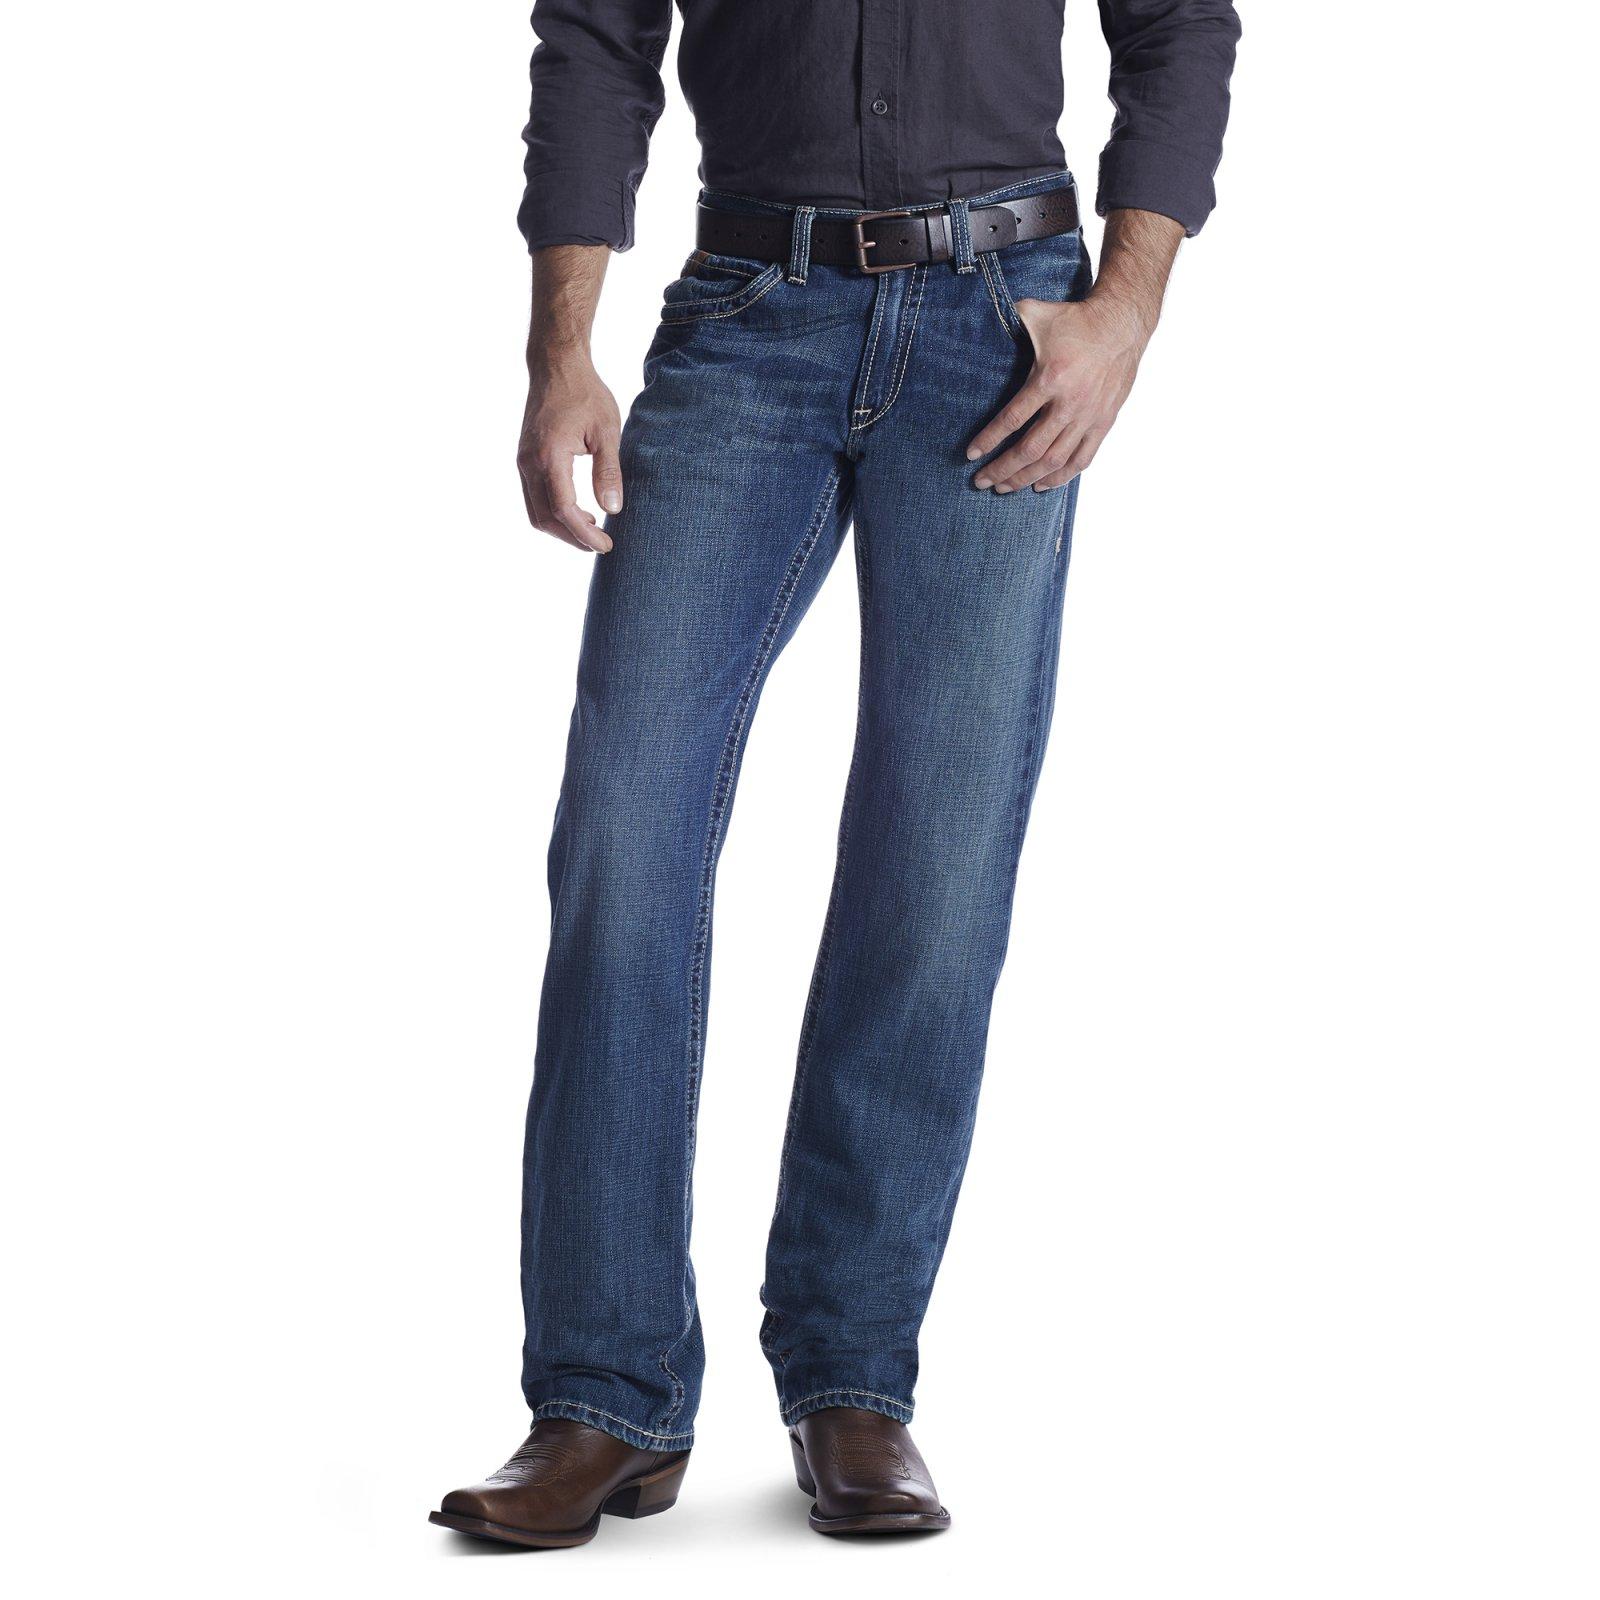 Men's M5 Gulch Jean from Ariat